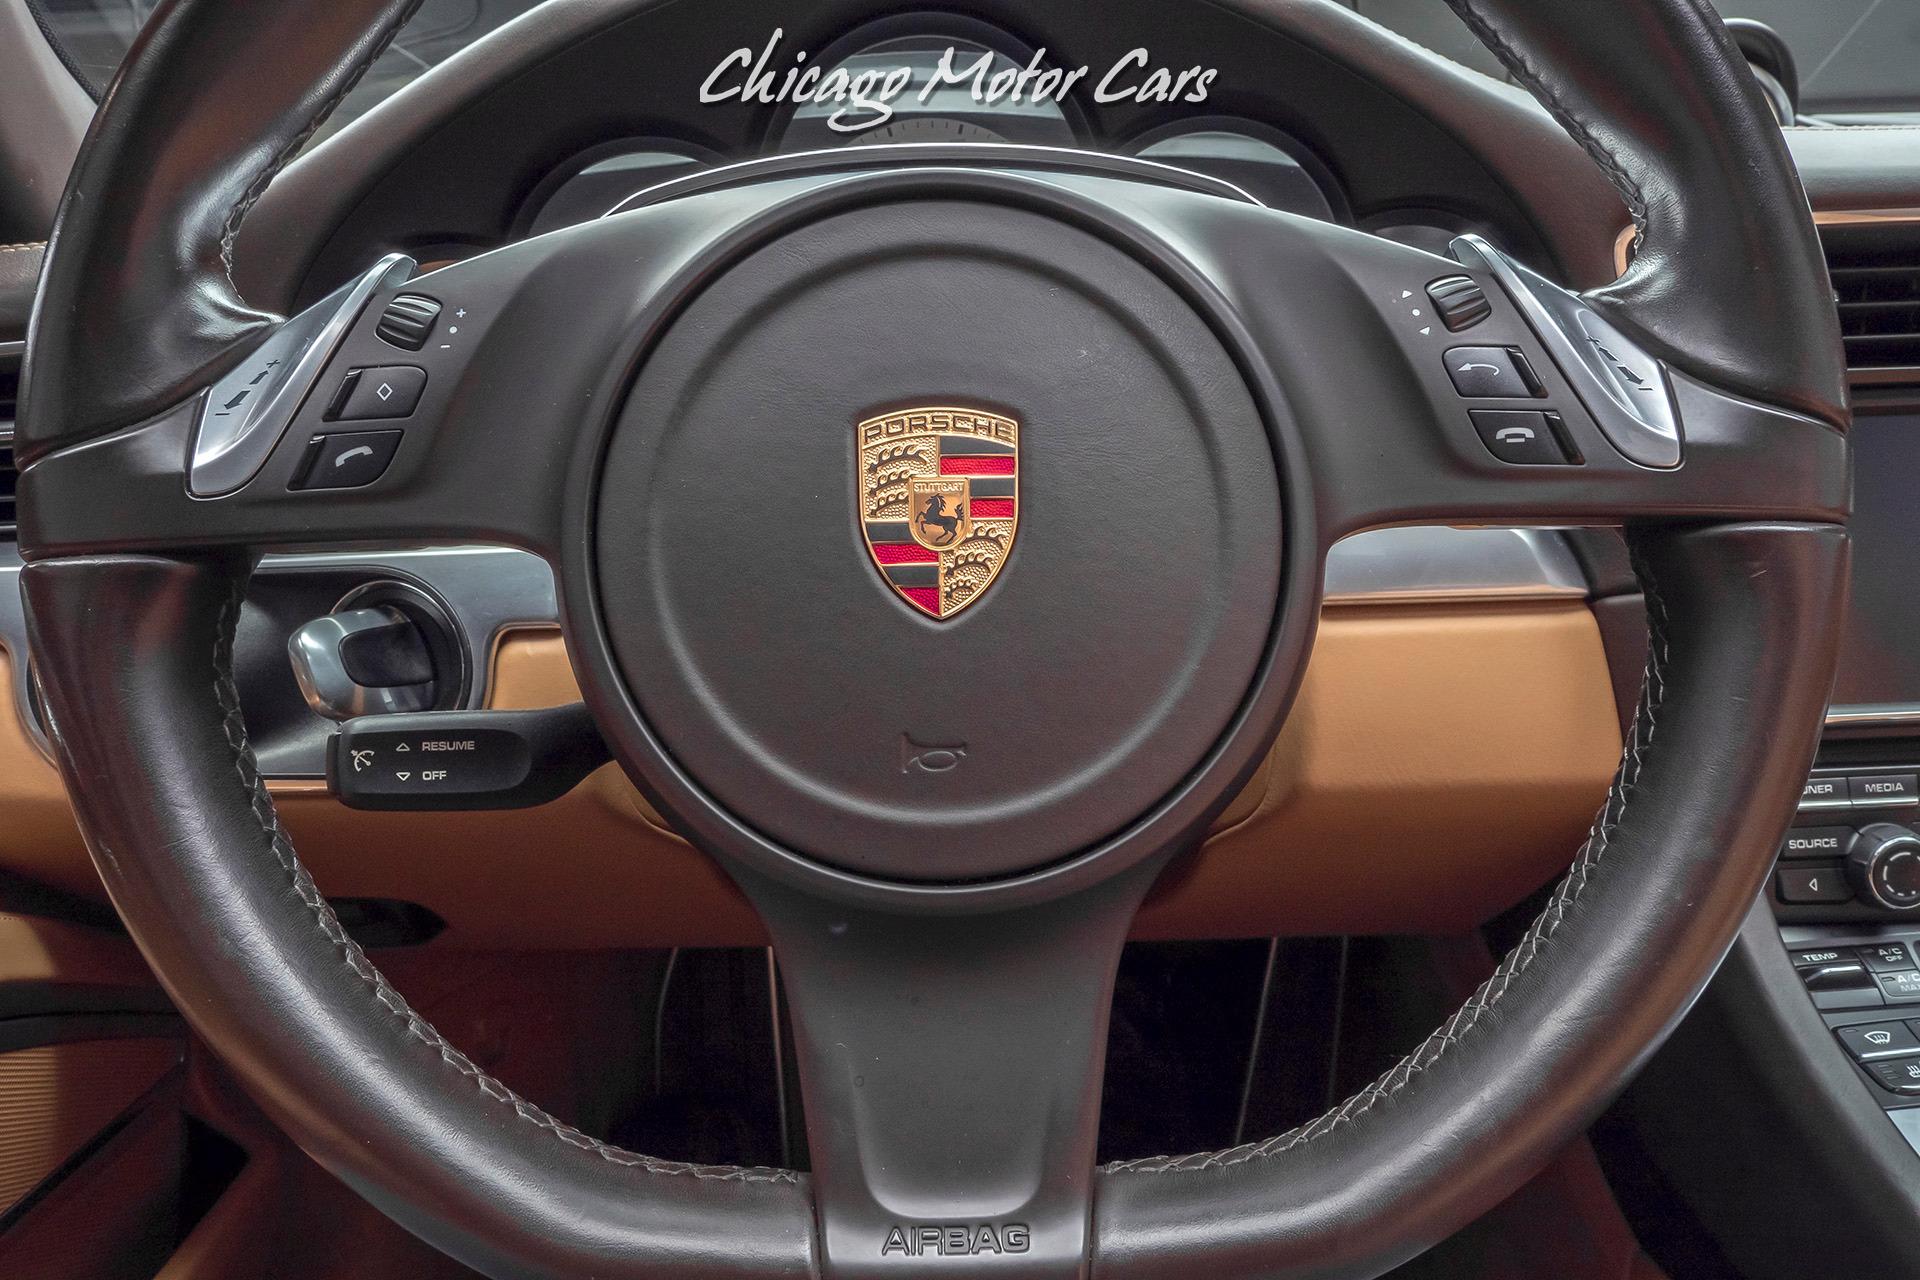 Used-2015-Porsche-911-Targa-4S-Original-MSRP-153k-LOADED-wFACTORY-OPTIONS